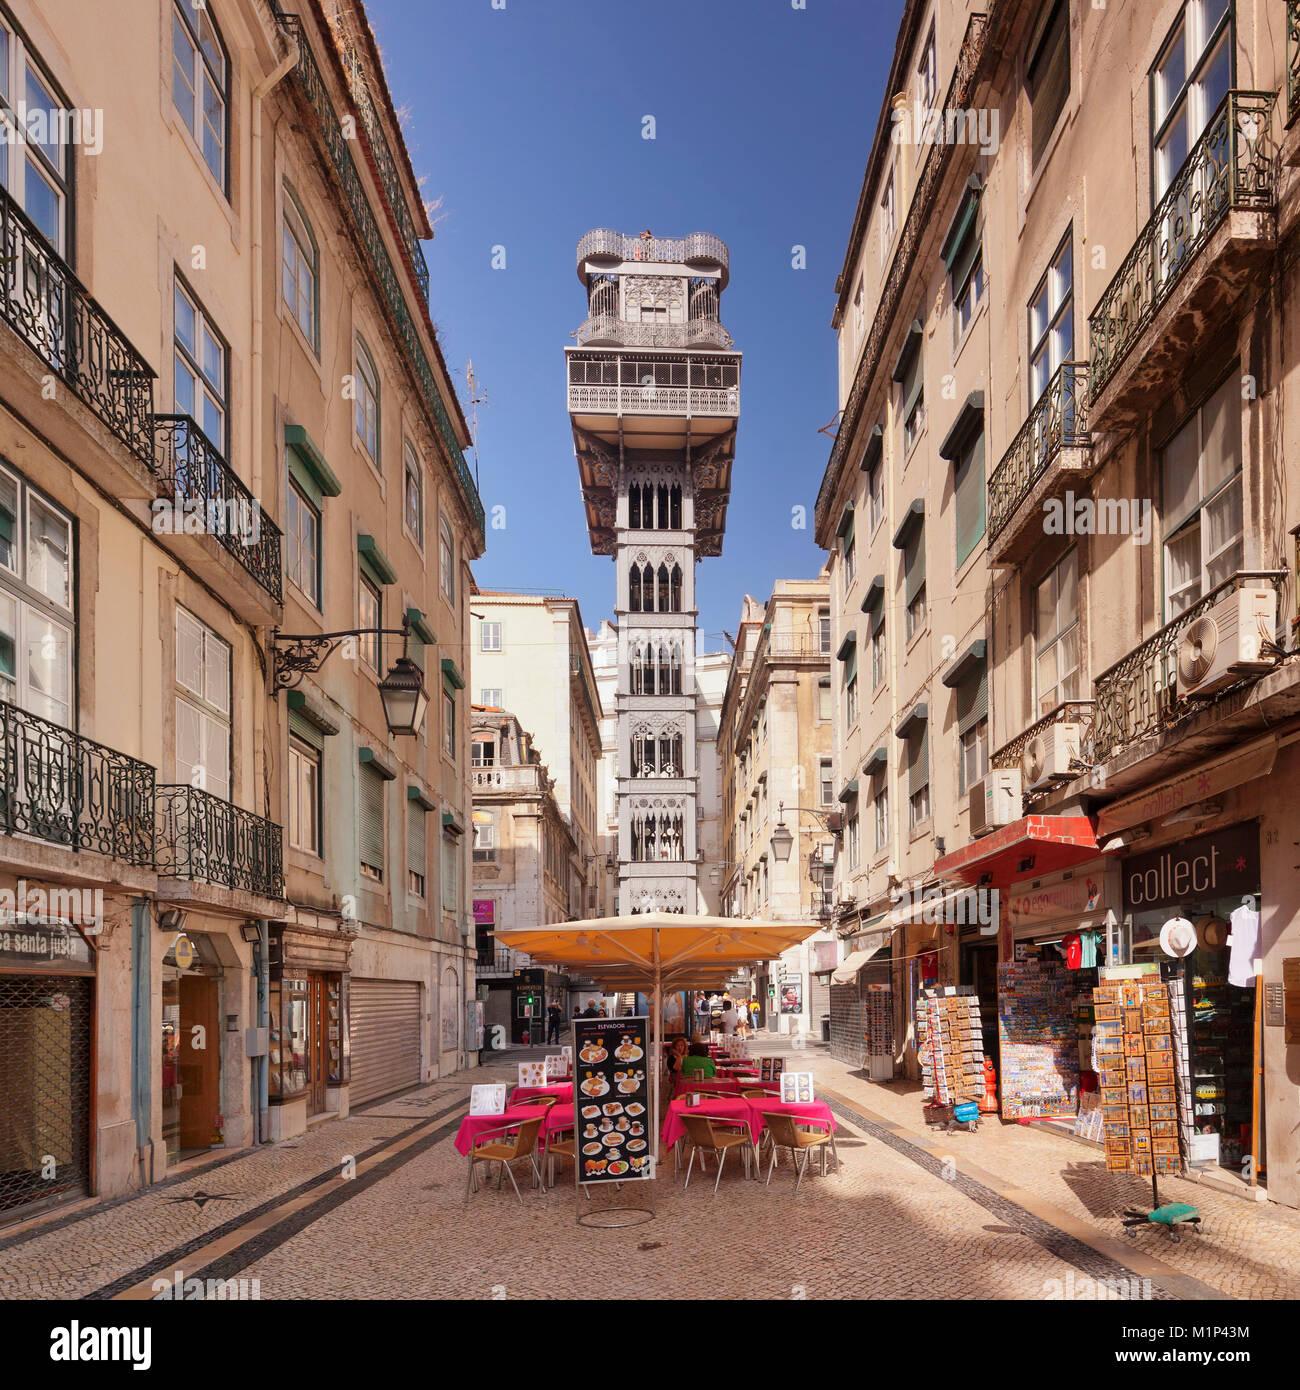 Elevador de Santa Justa (Santa Justa Elevator), Baixa, Lisbon, Portugal, Europe - Stock Image